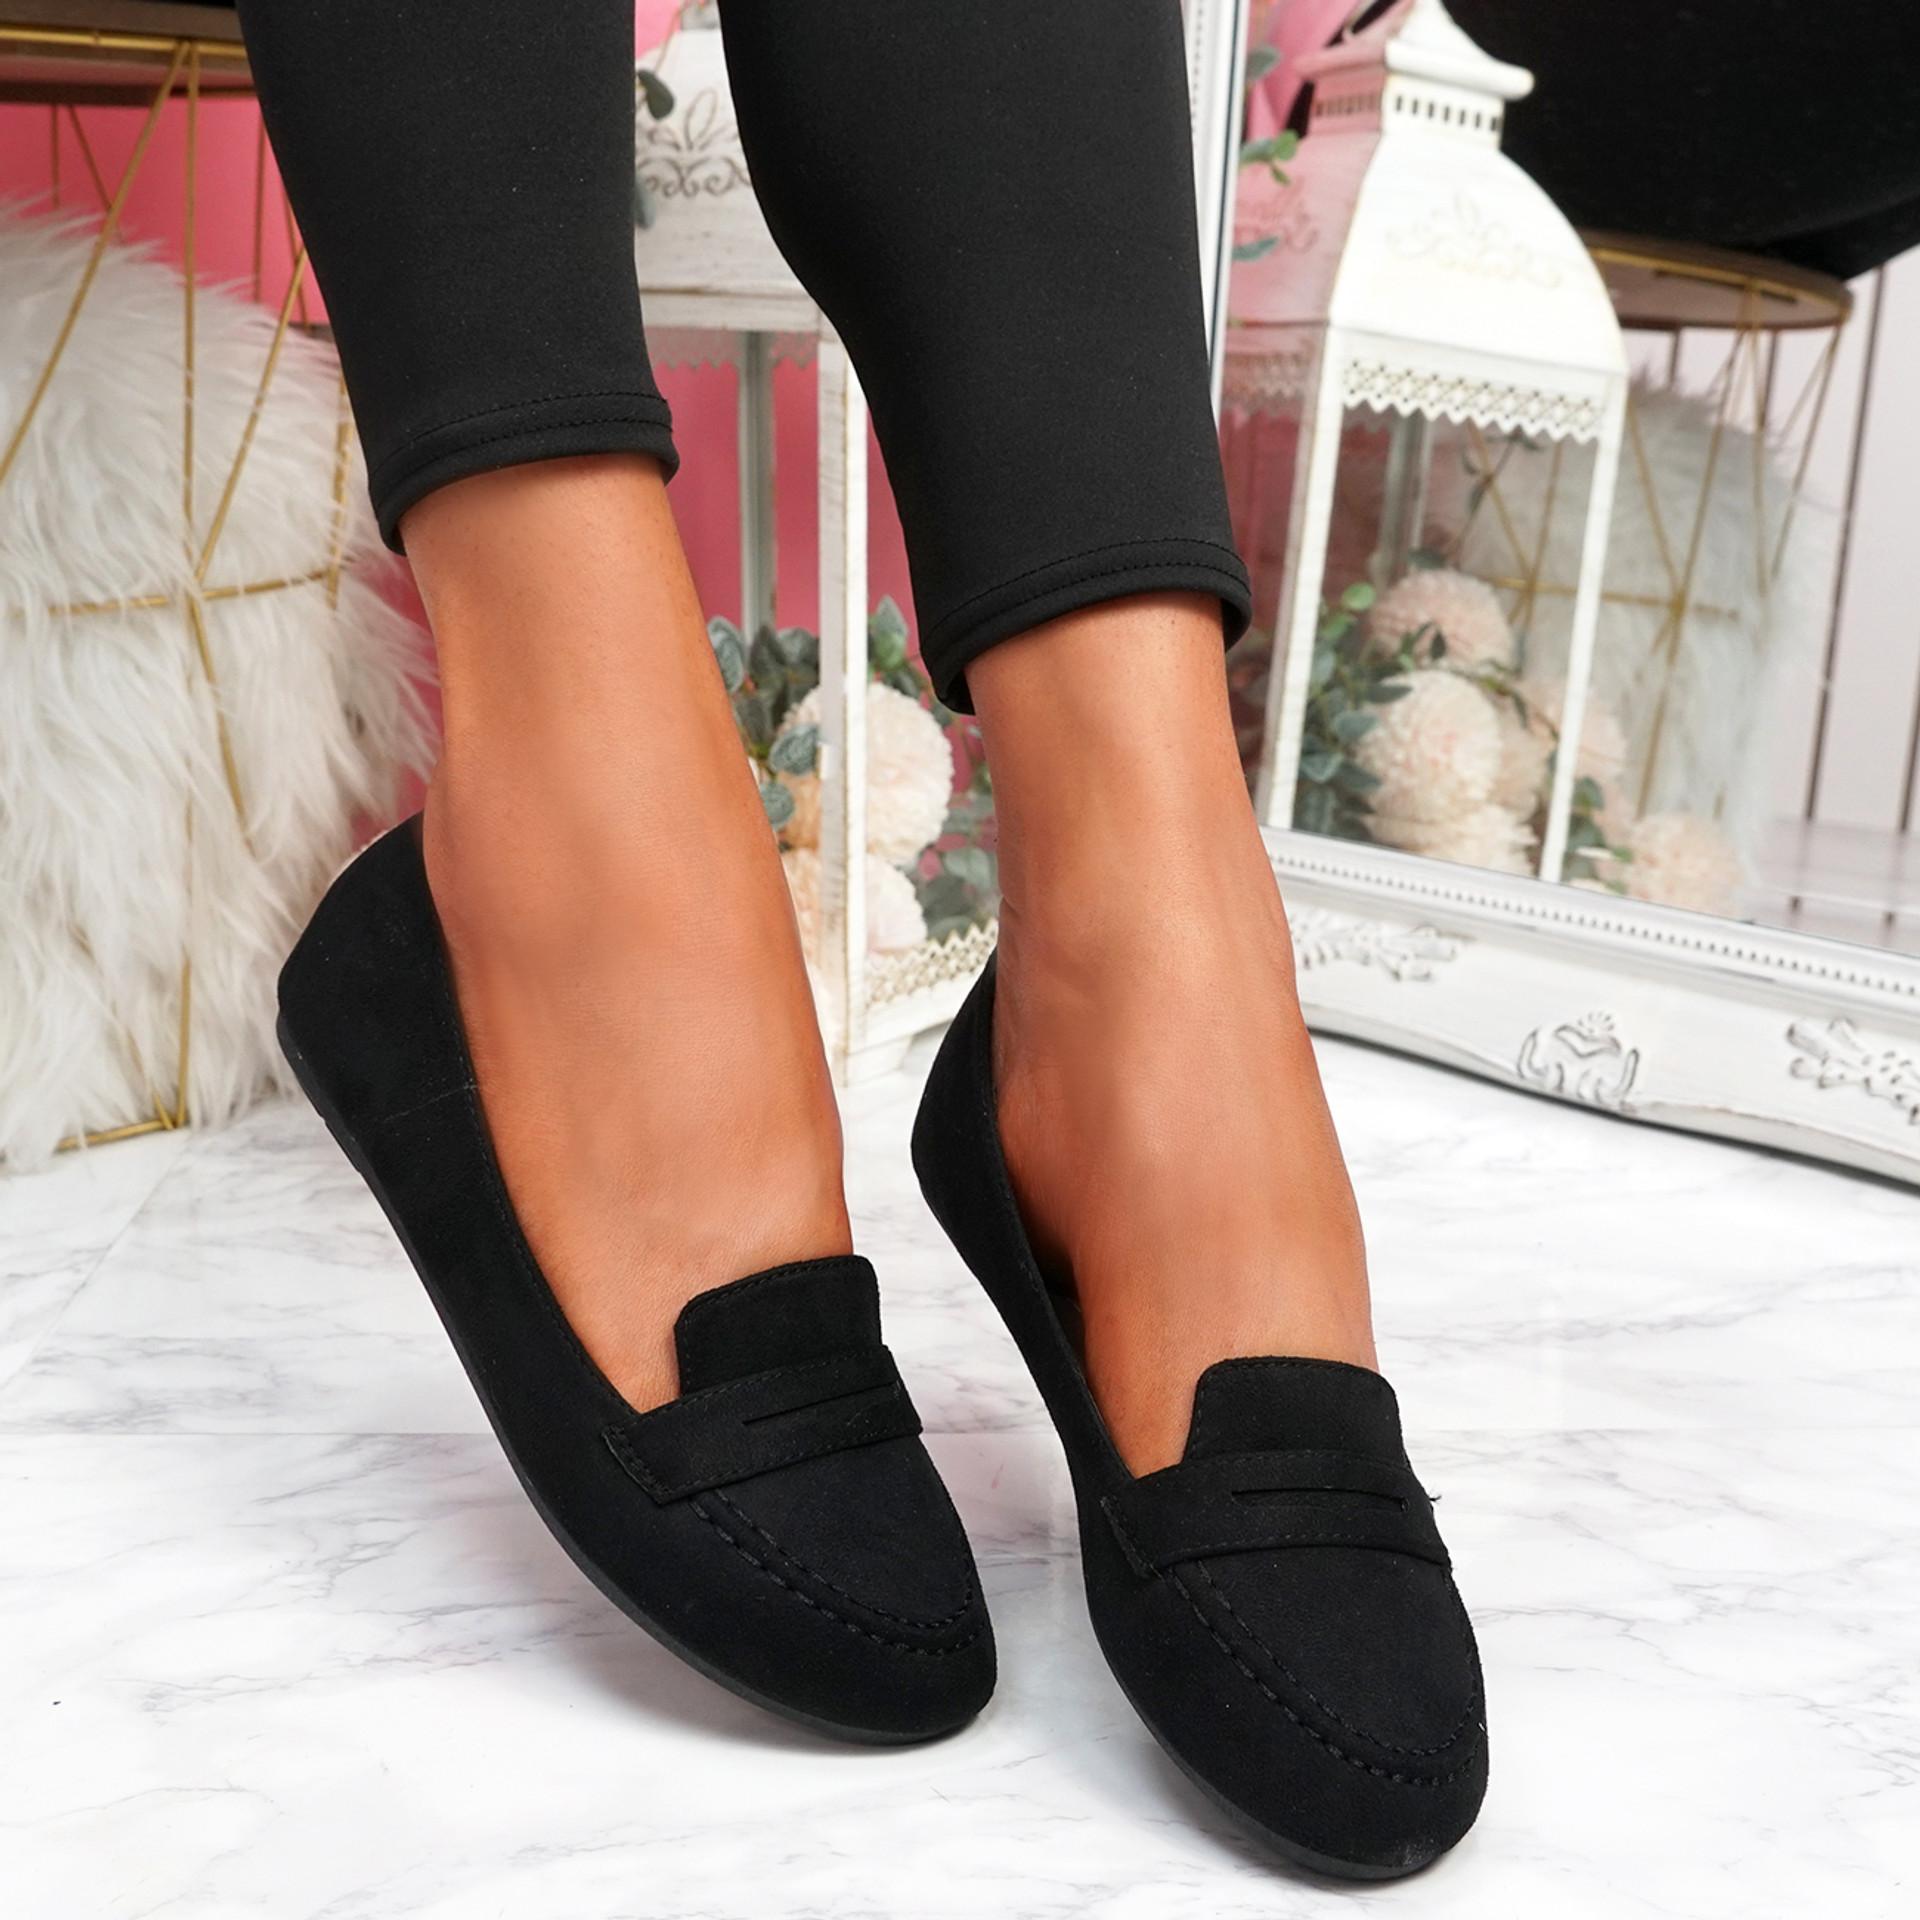 Oze Black Flat Ballerinas